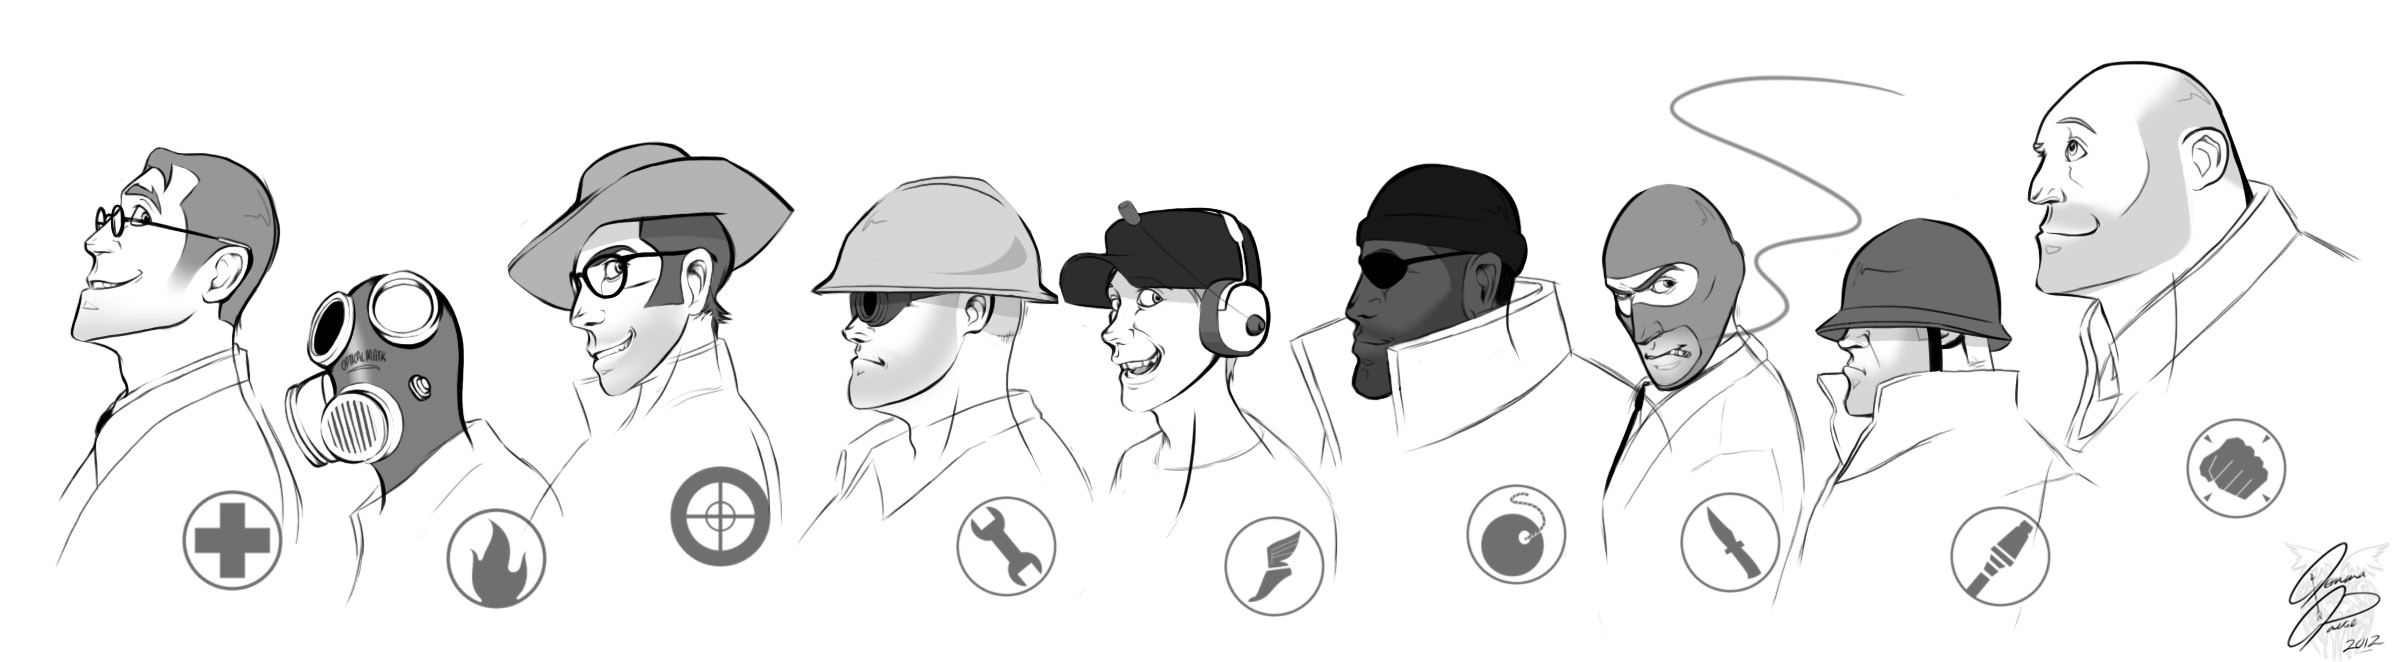 Mercenary Profiles